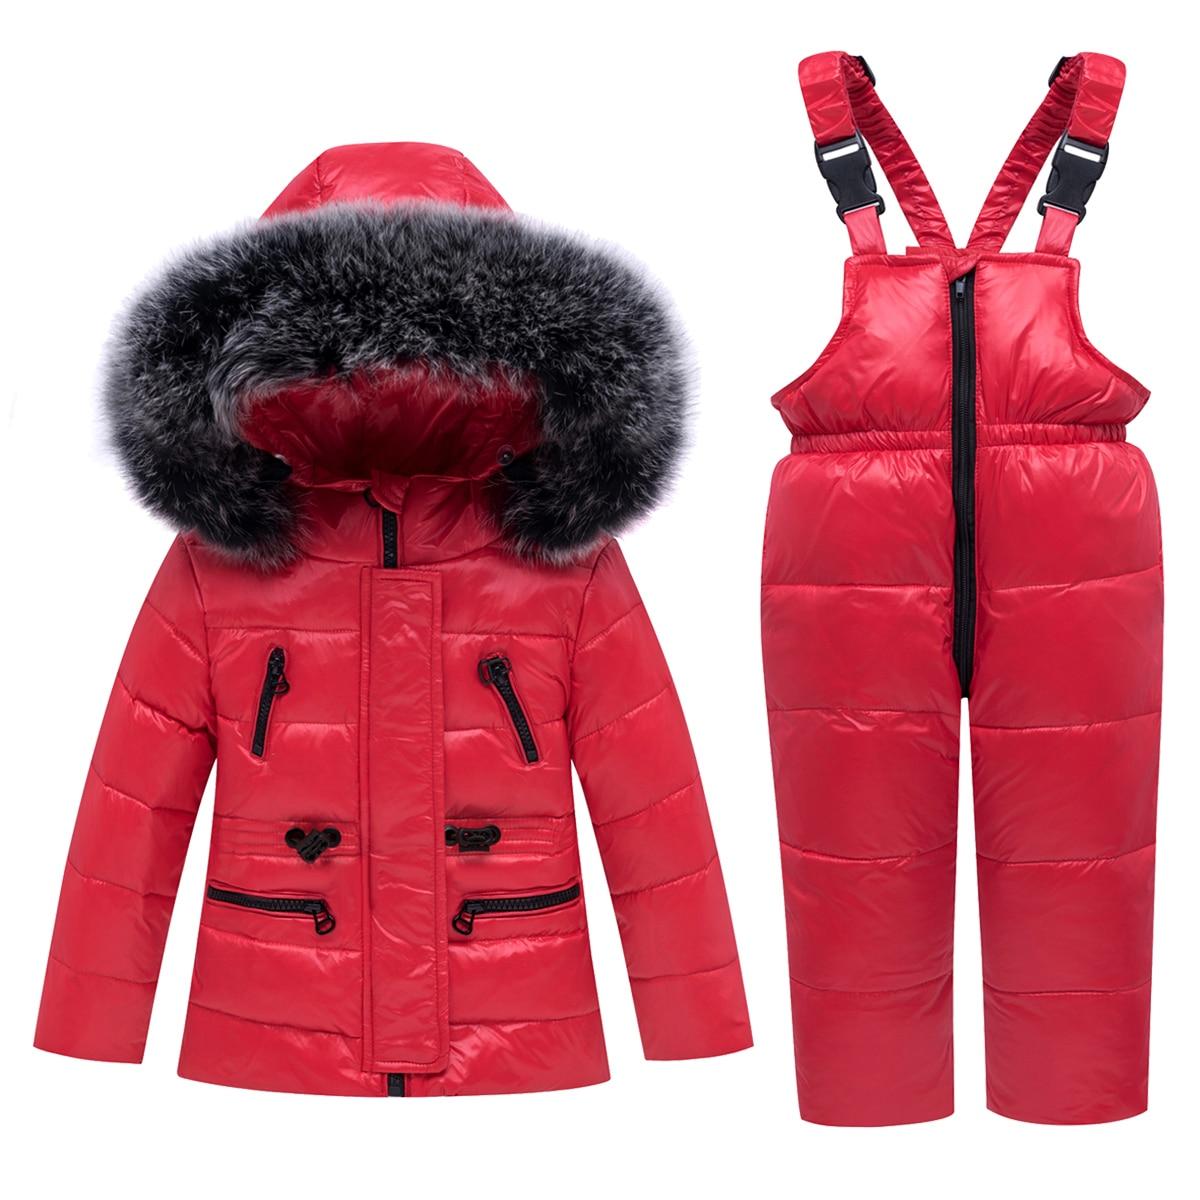 2019 novo inverno bebê menino menina roupas